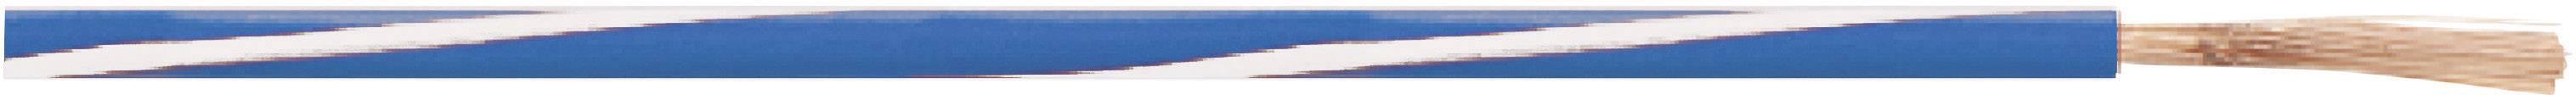 Opletenie / lanko LappKabel 4512232S X05V-K, 1 x 0.75 mm², vonkajší Ø 2.40 mm, metrový tovar, modrá, čierna